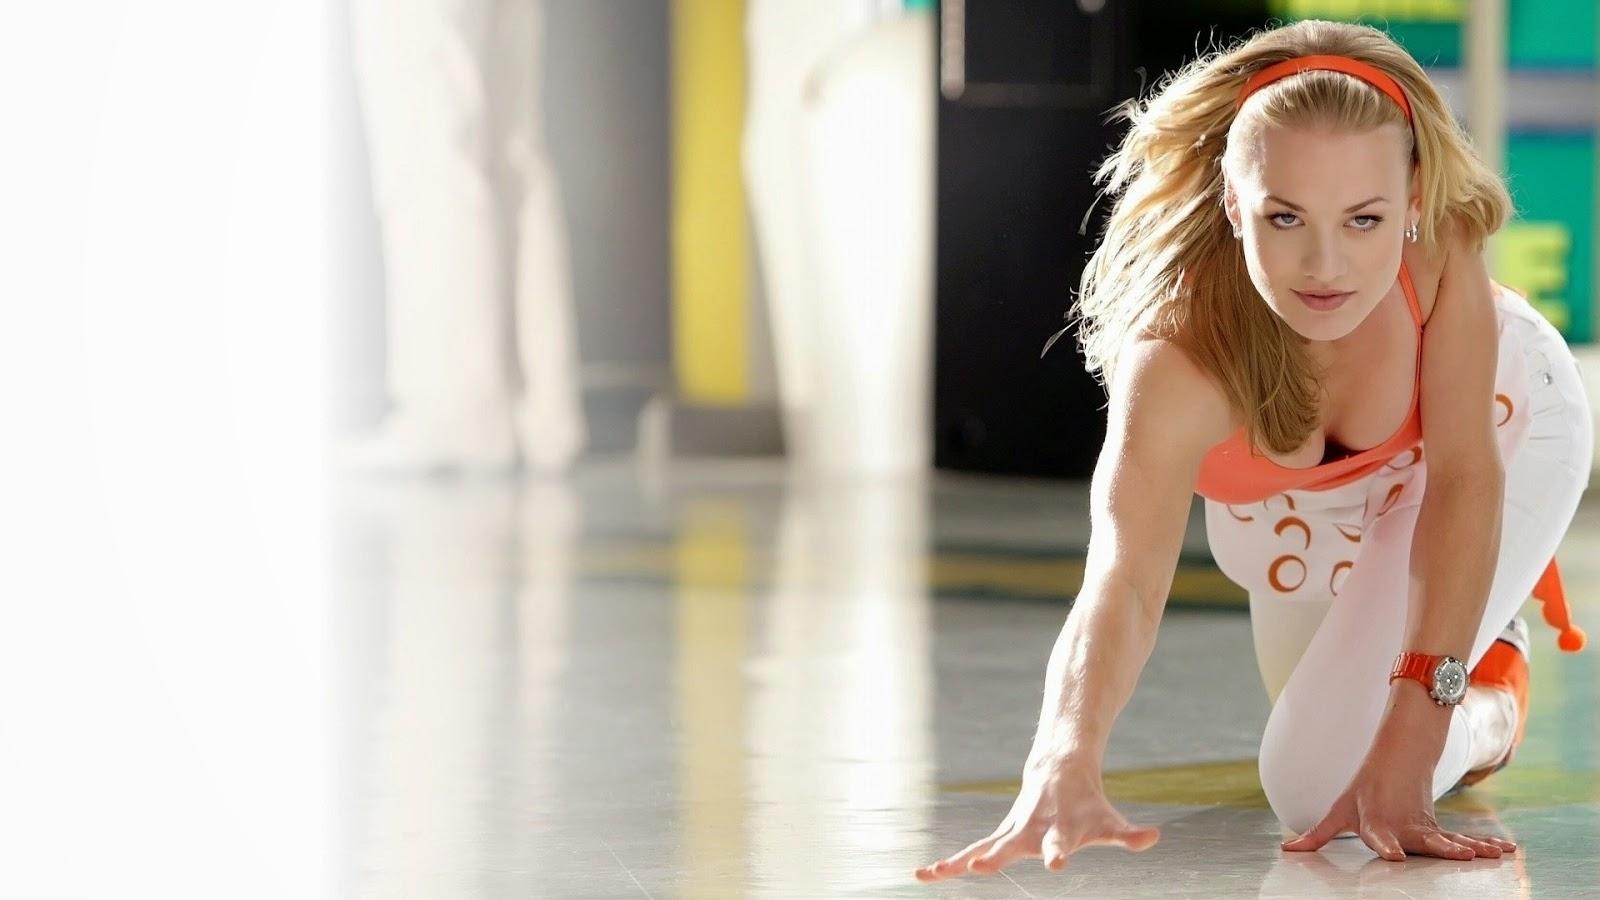 Emma Stone Amazing Spiderman Hd Wallpapers | HDsheet Andrew Garfield